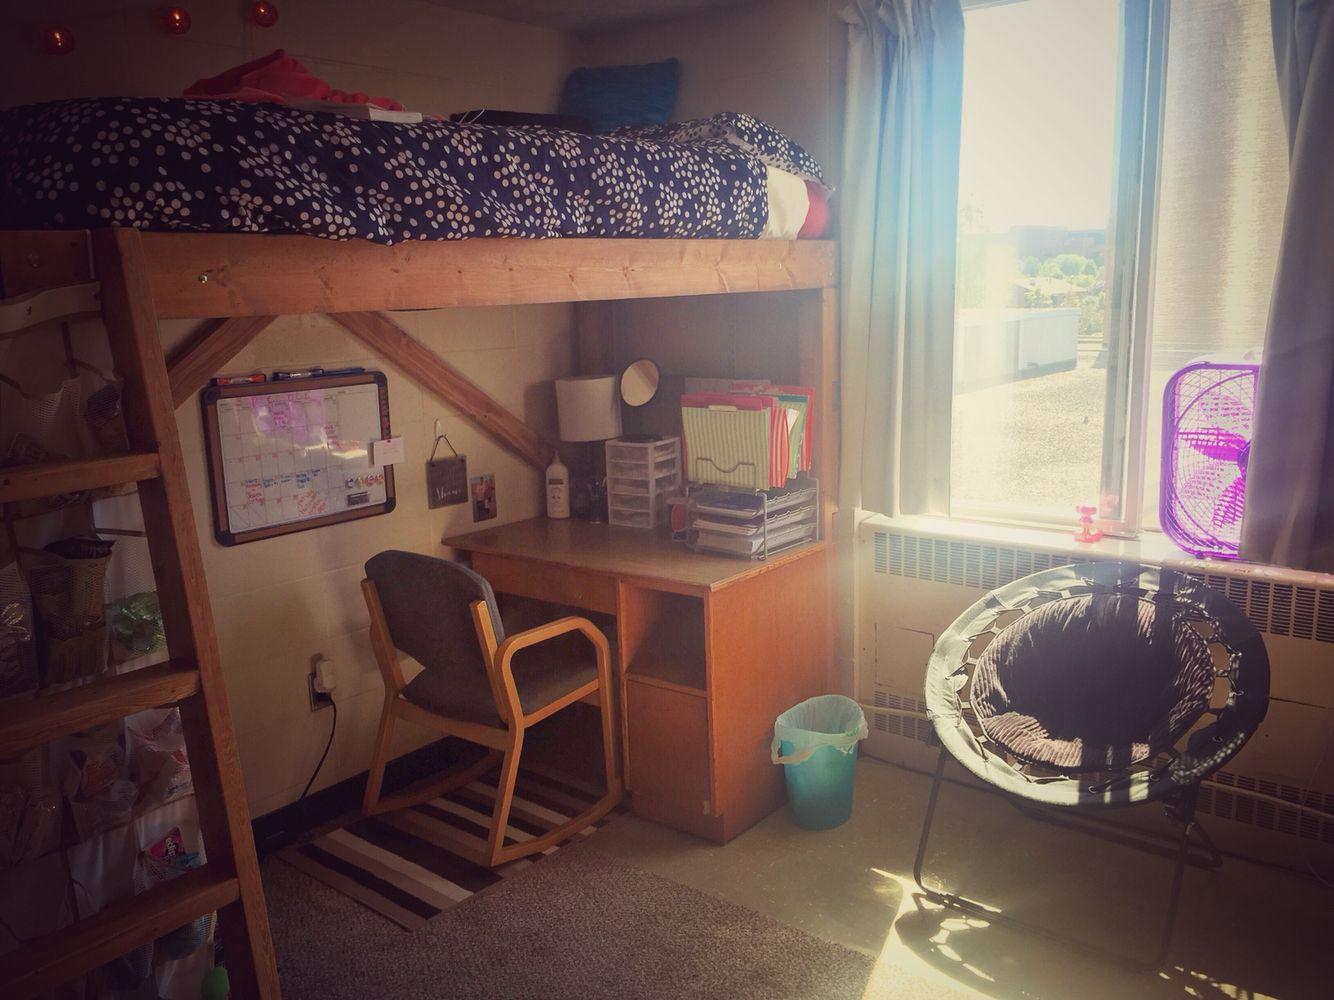 Ball State University Lafollette Shales Hall Dorm Sweet Dorm